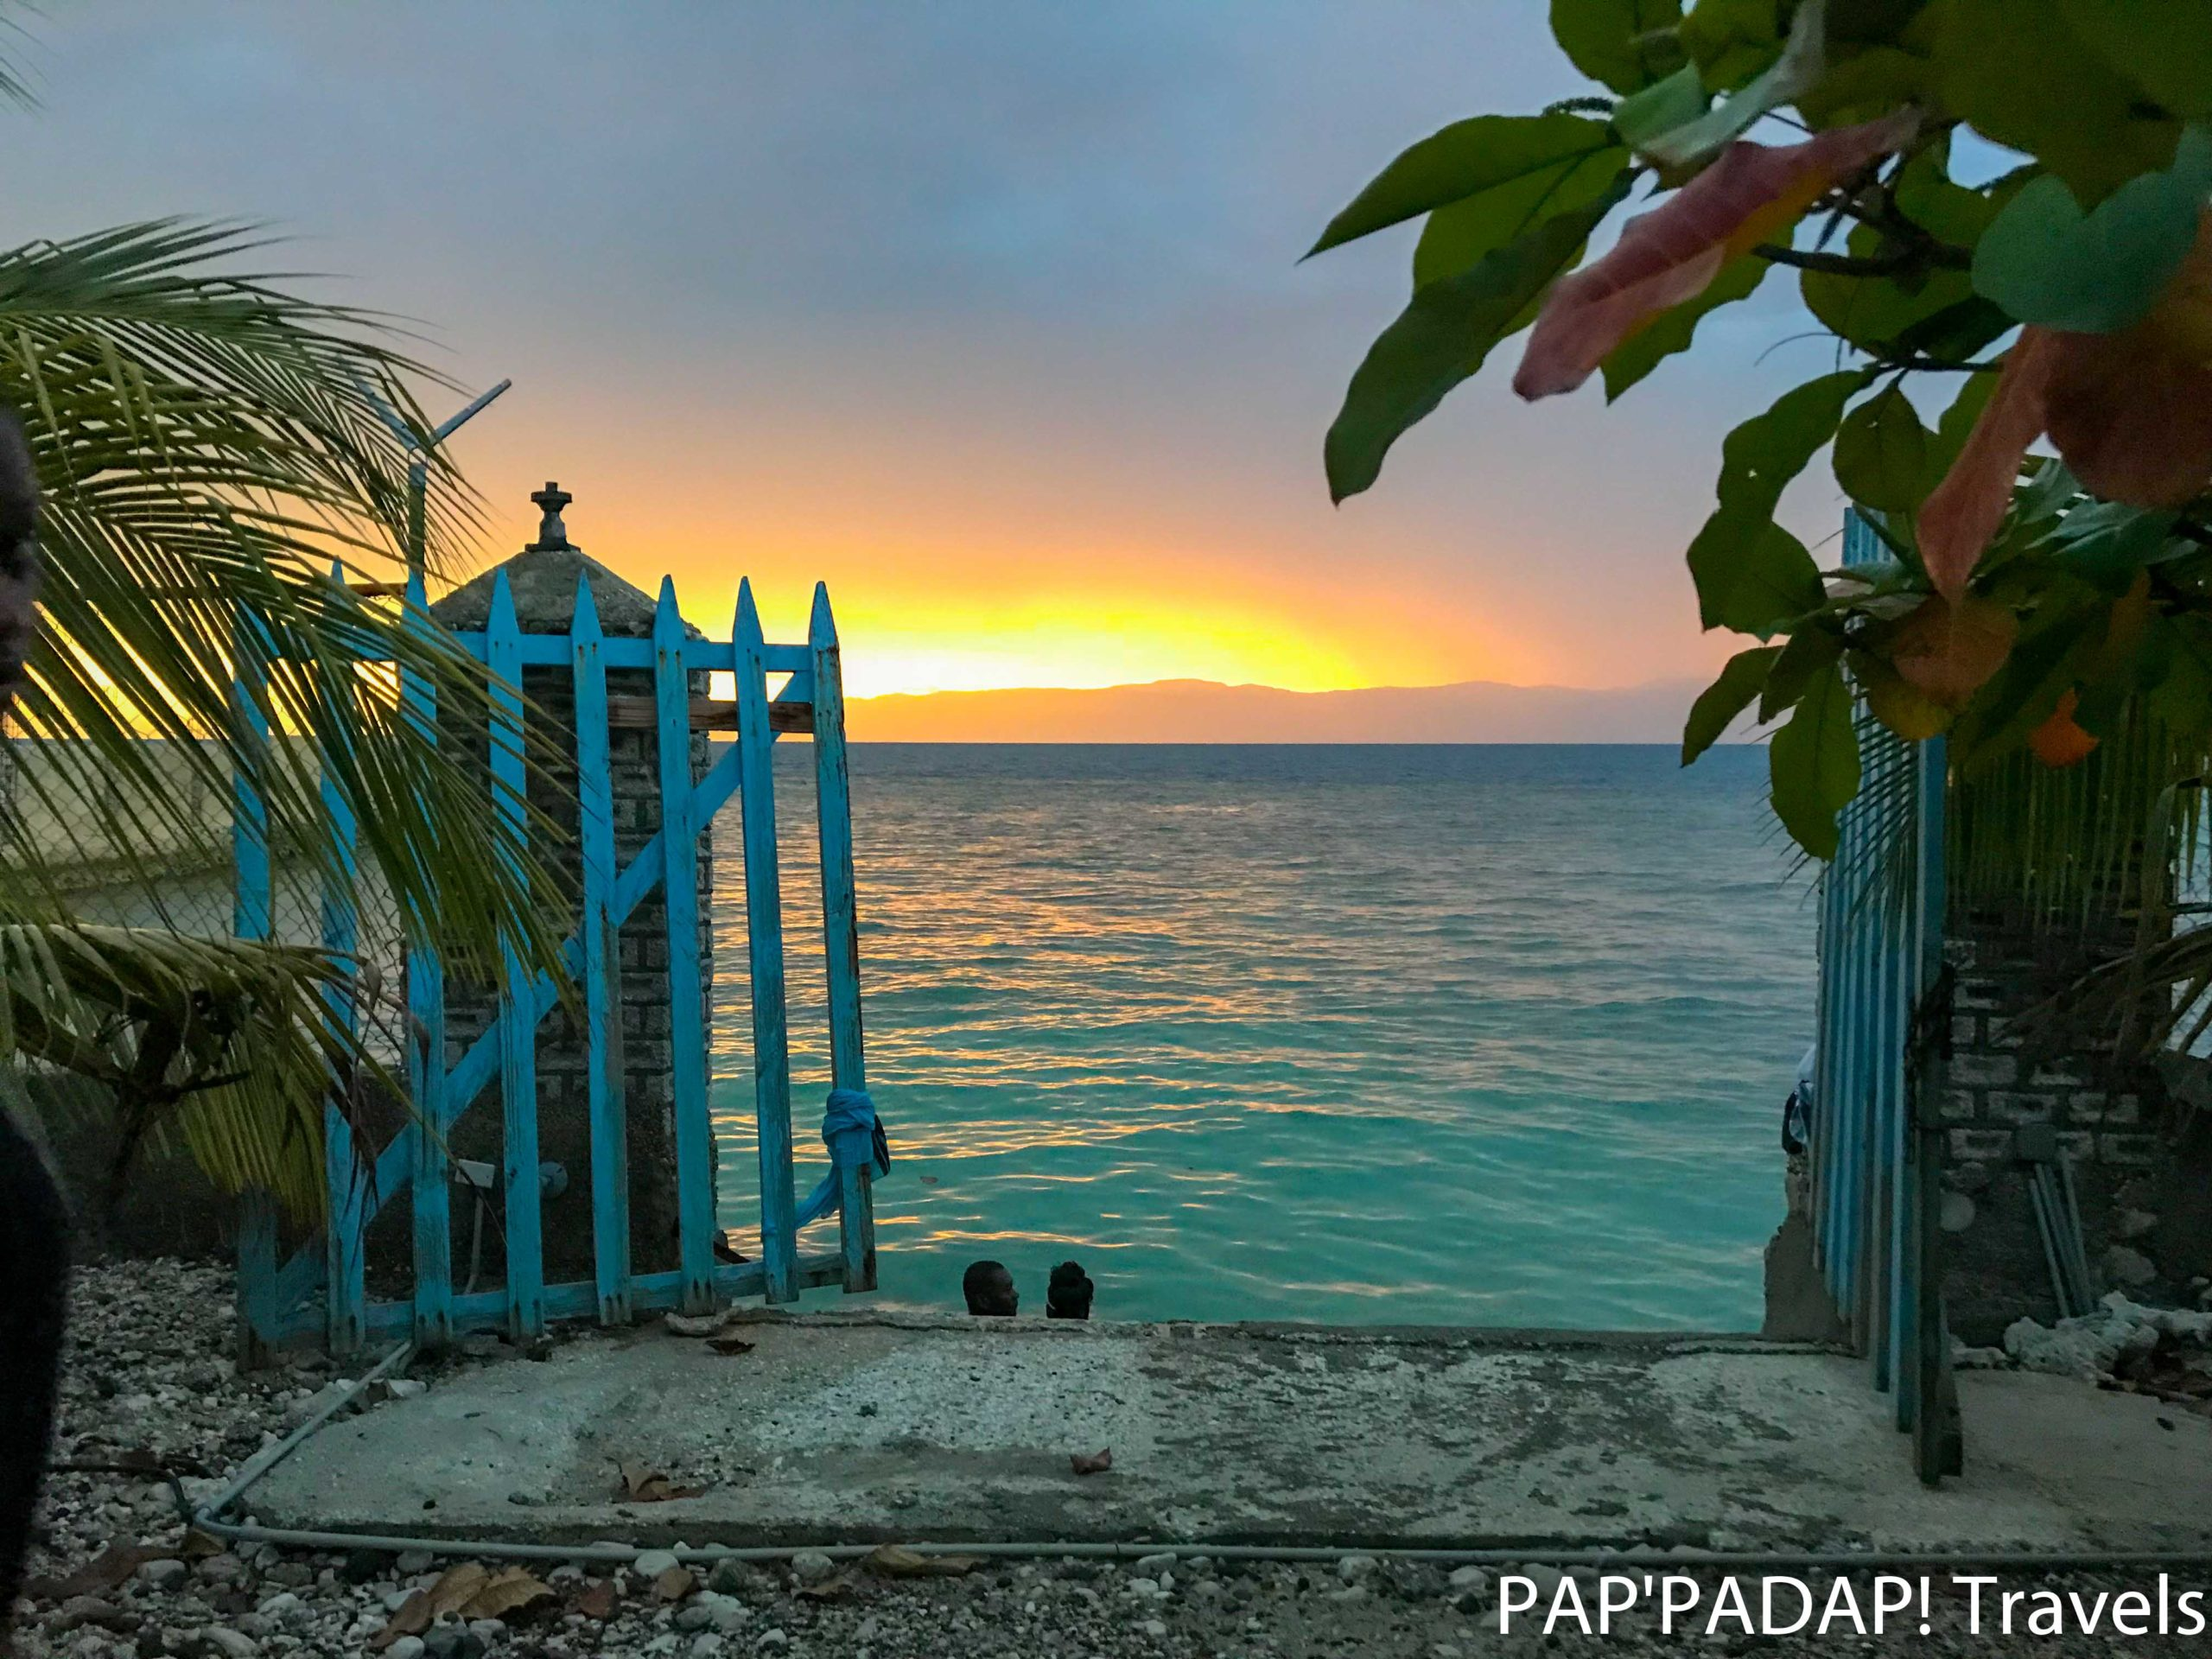 Plage Bel Horizon - Sunset - Leogane - Ouest - Haiti